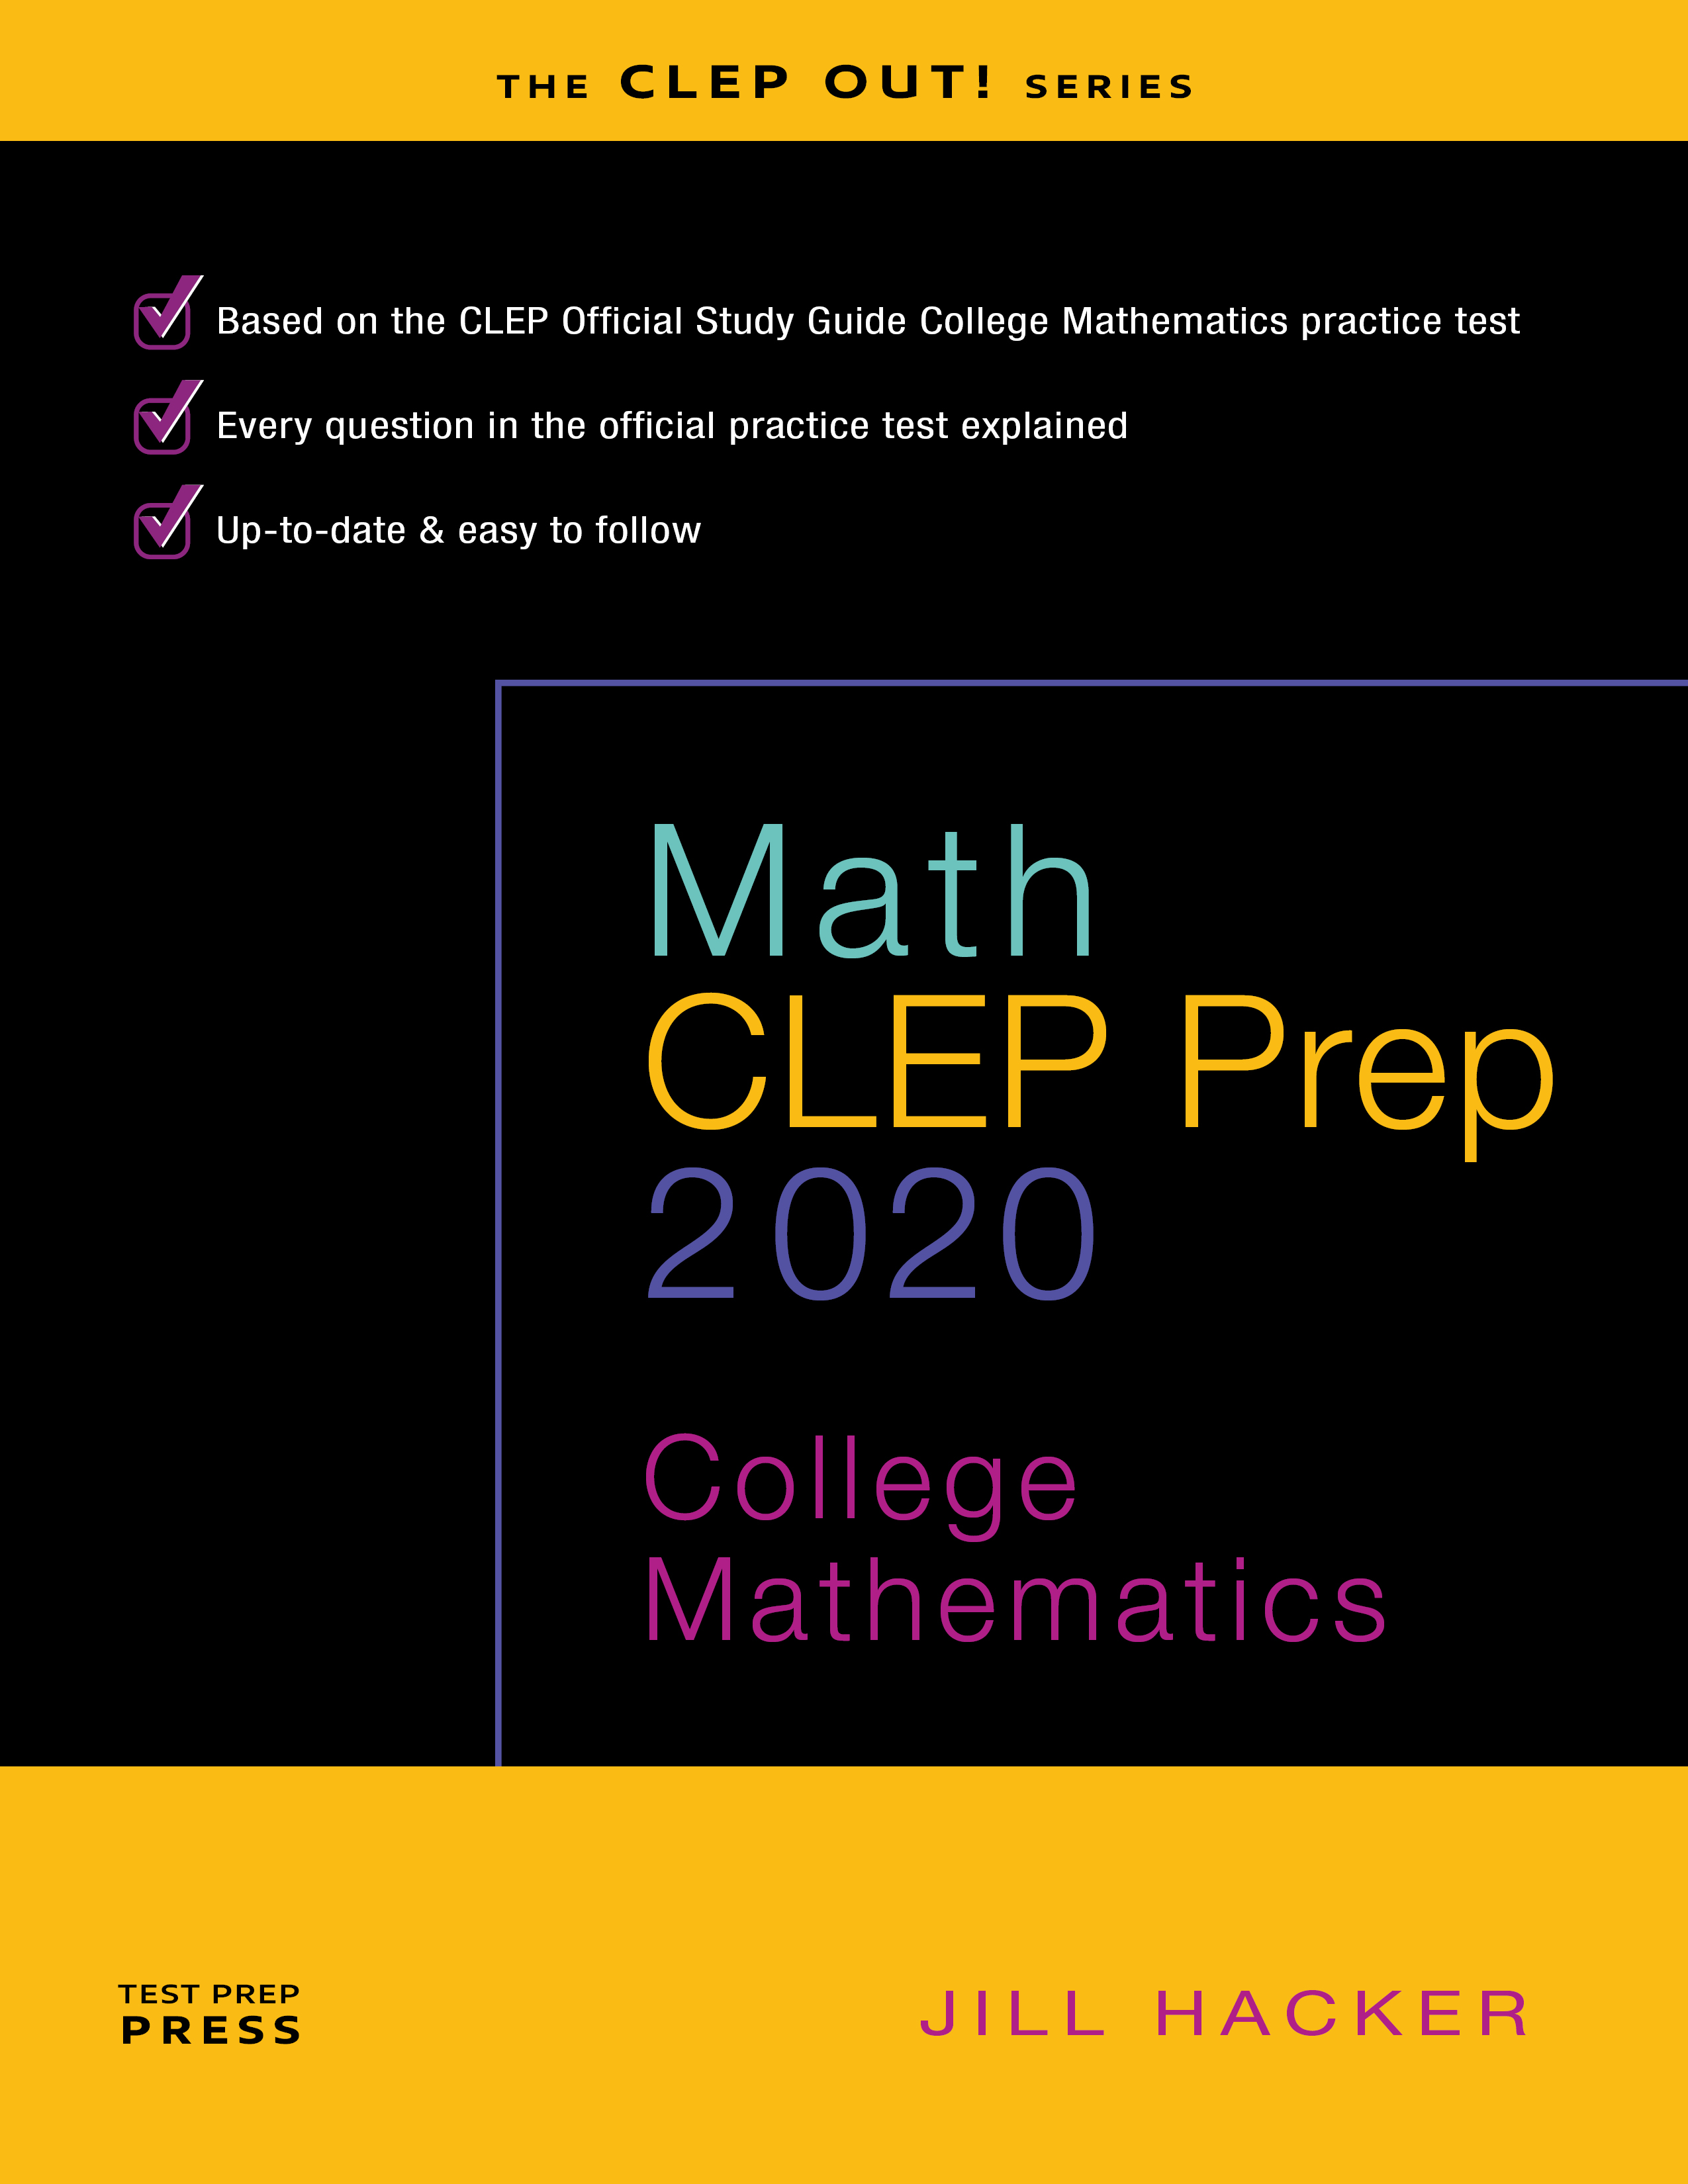 Math CLEP Prep College Mathematics 2020 study guide